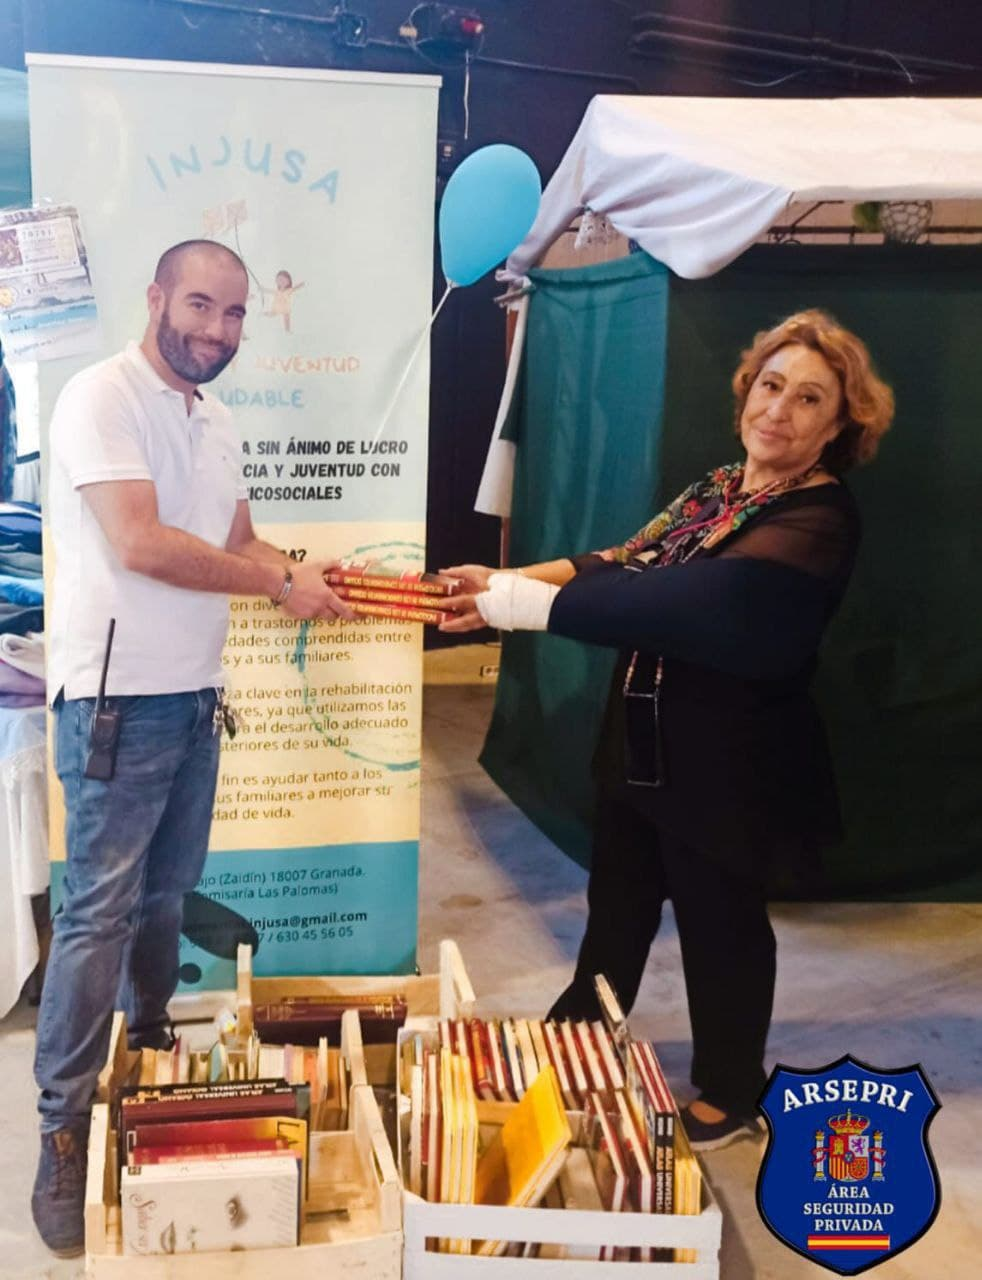 Arsepri Formación donando libros a INJUSA – GRANABIP